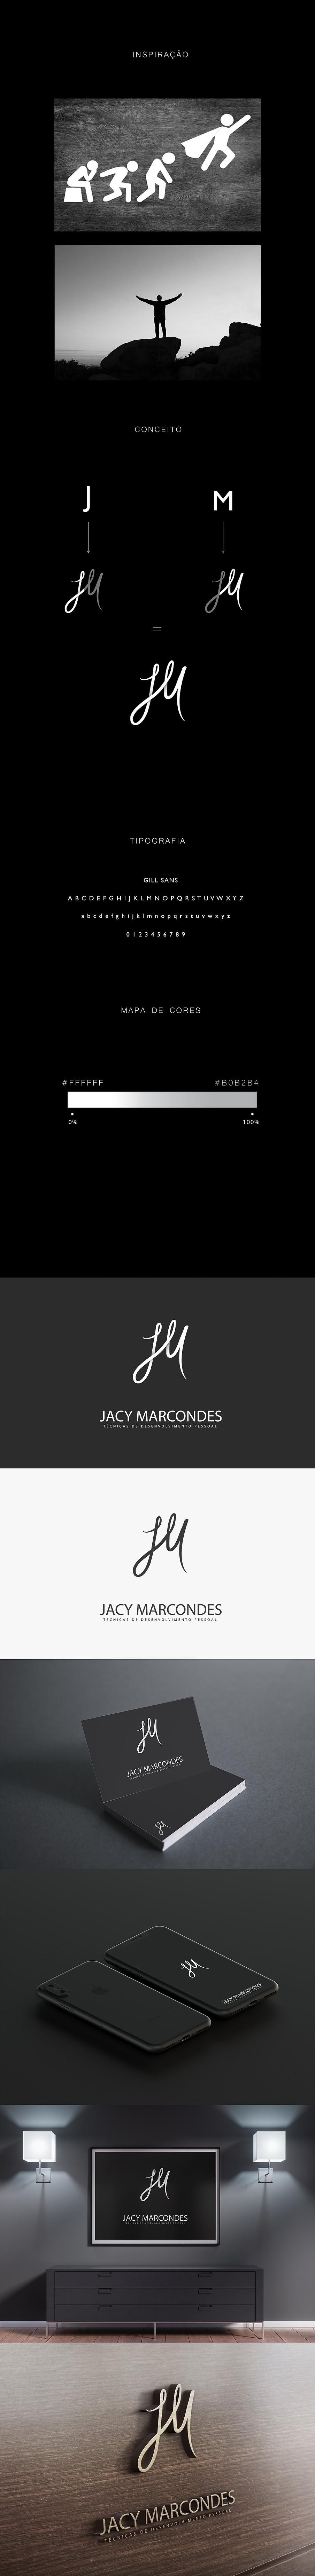 Jacy_Marcondes_apresentação.jpg